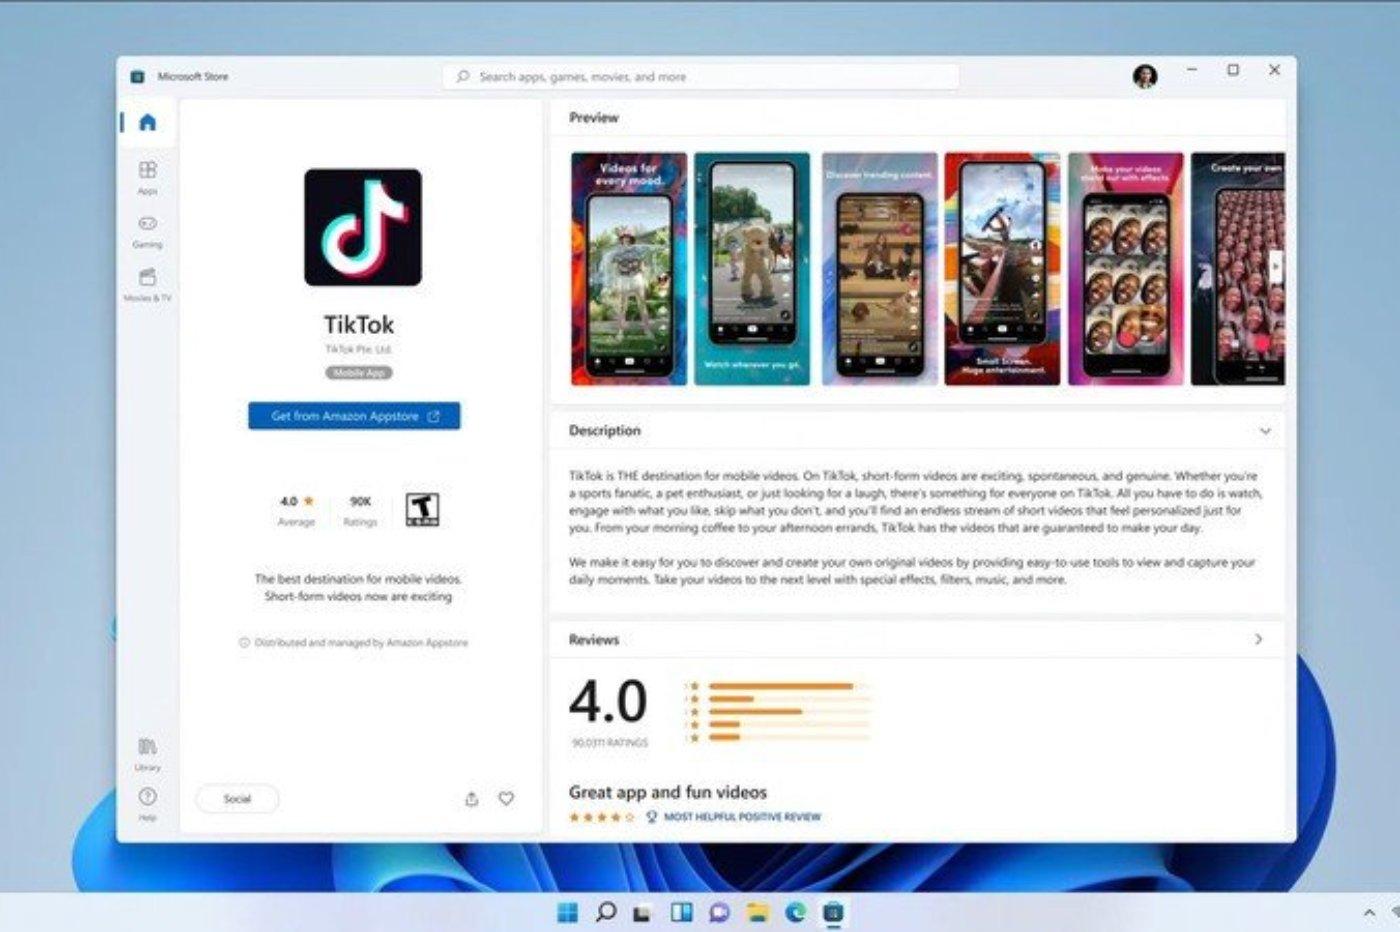 TikTok Microsoft Store